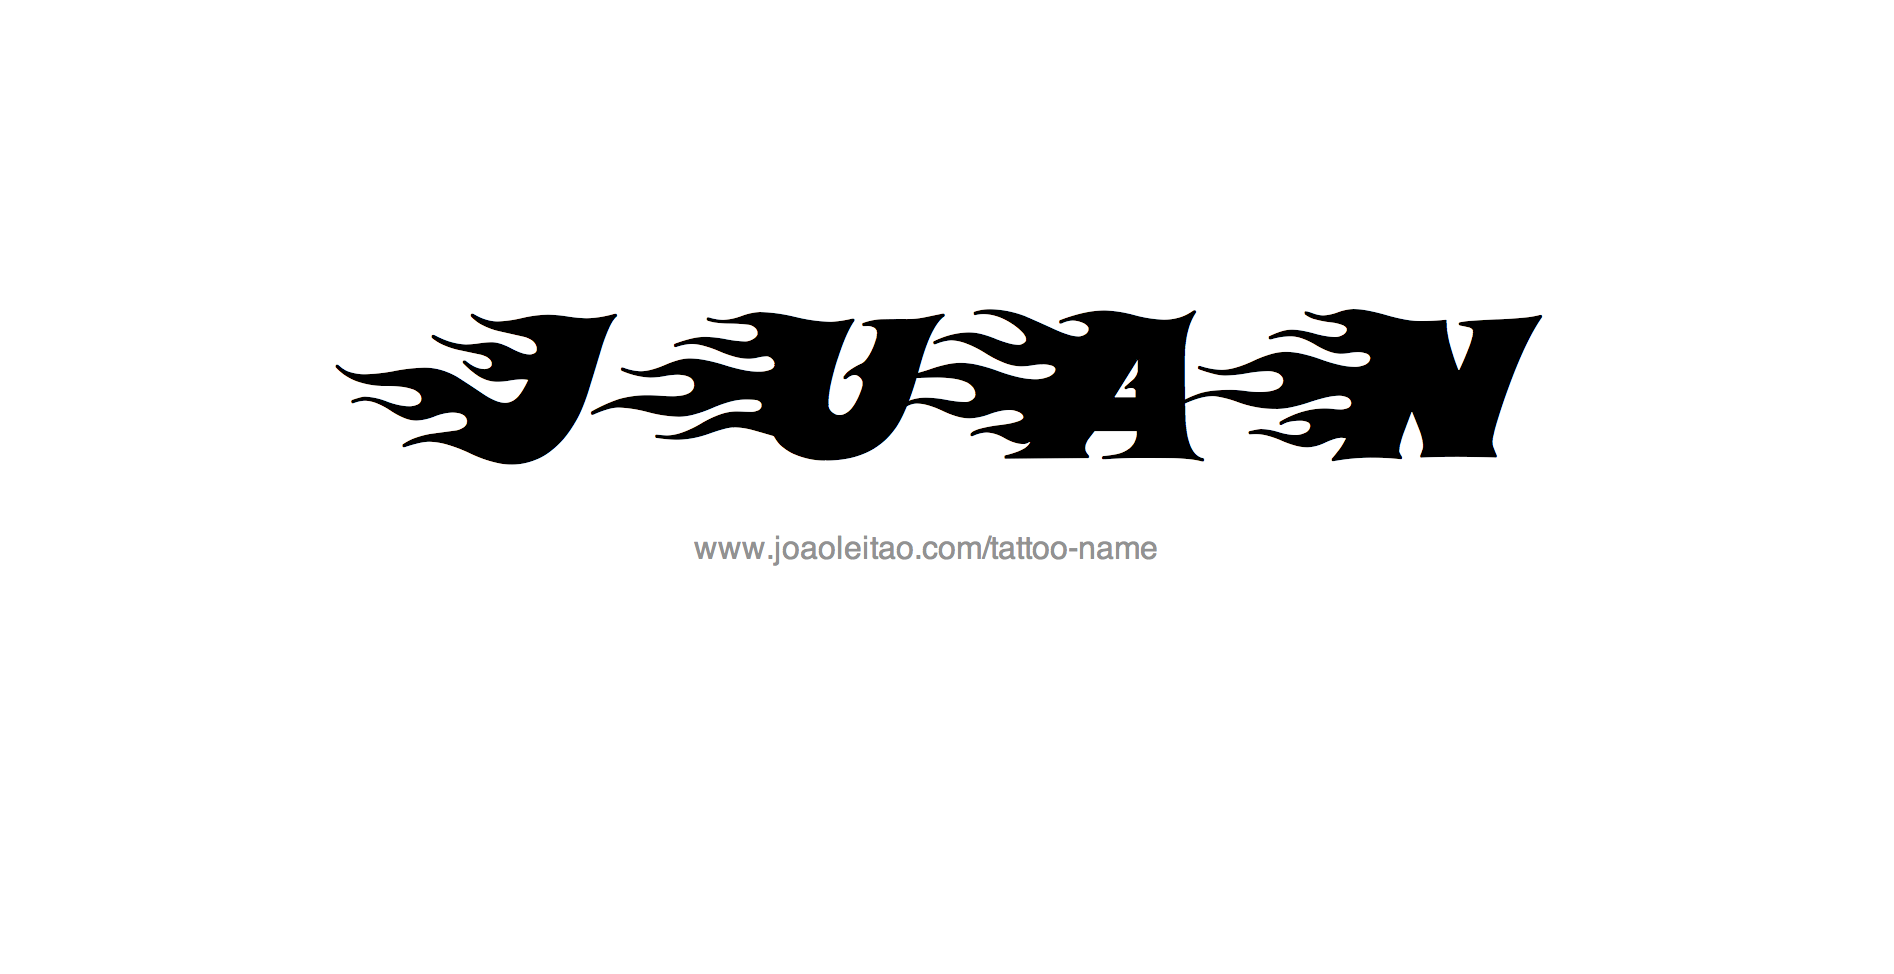 Juan Name Tattoo Designs